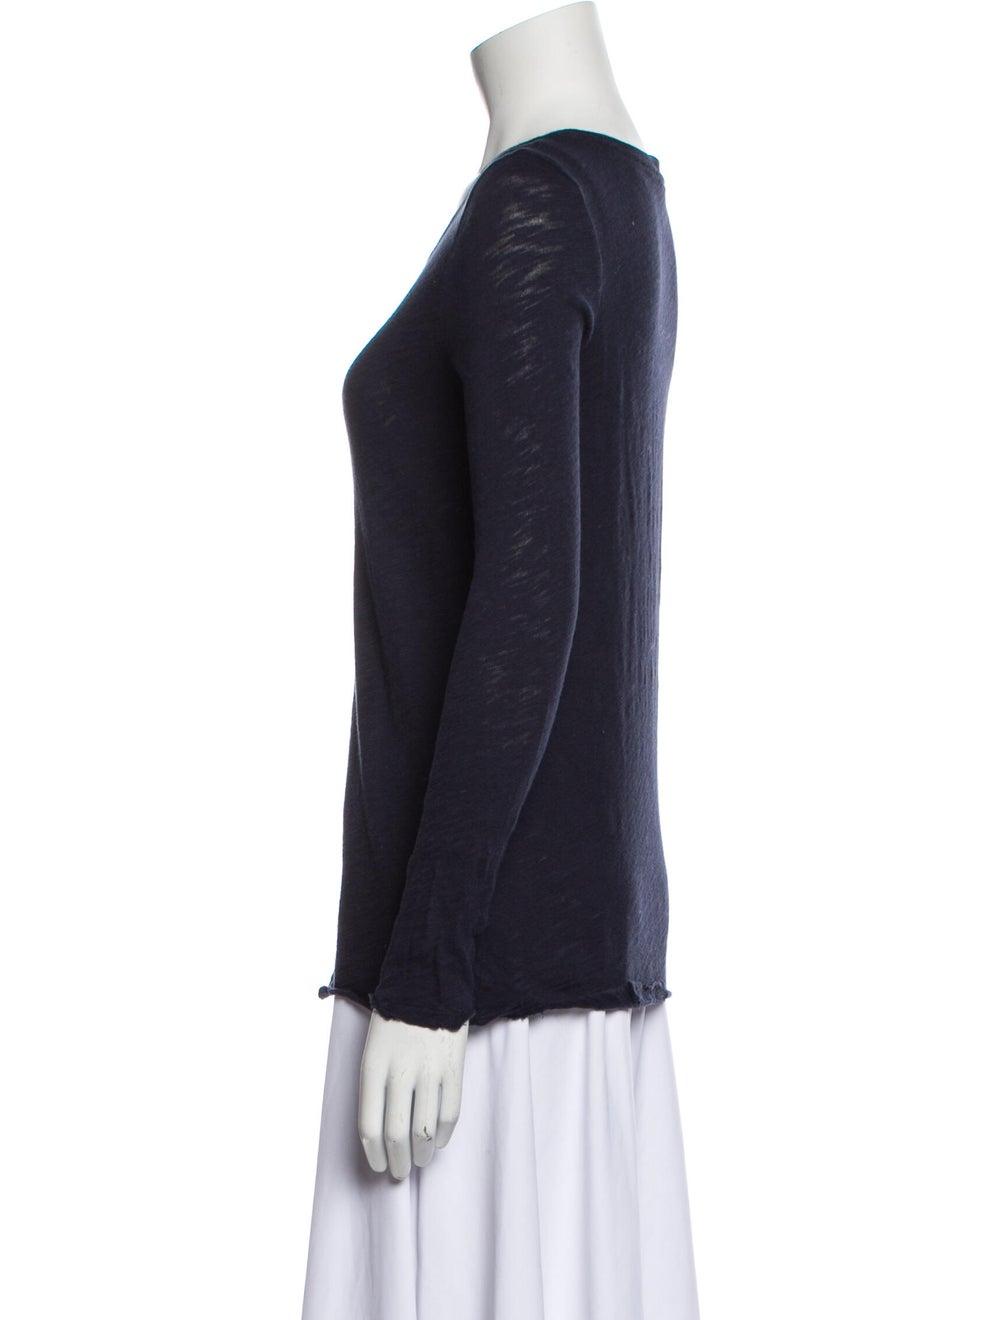 ATM Scoop Neck Long Sleeve T-Shirt Blue - image 2